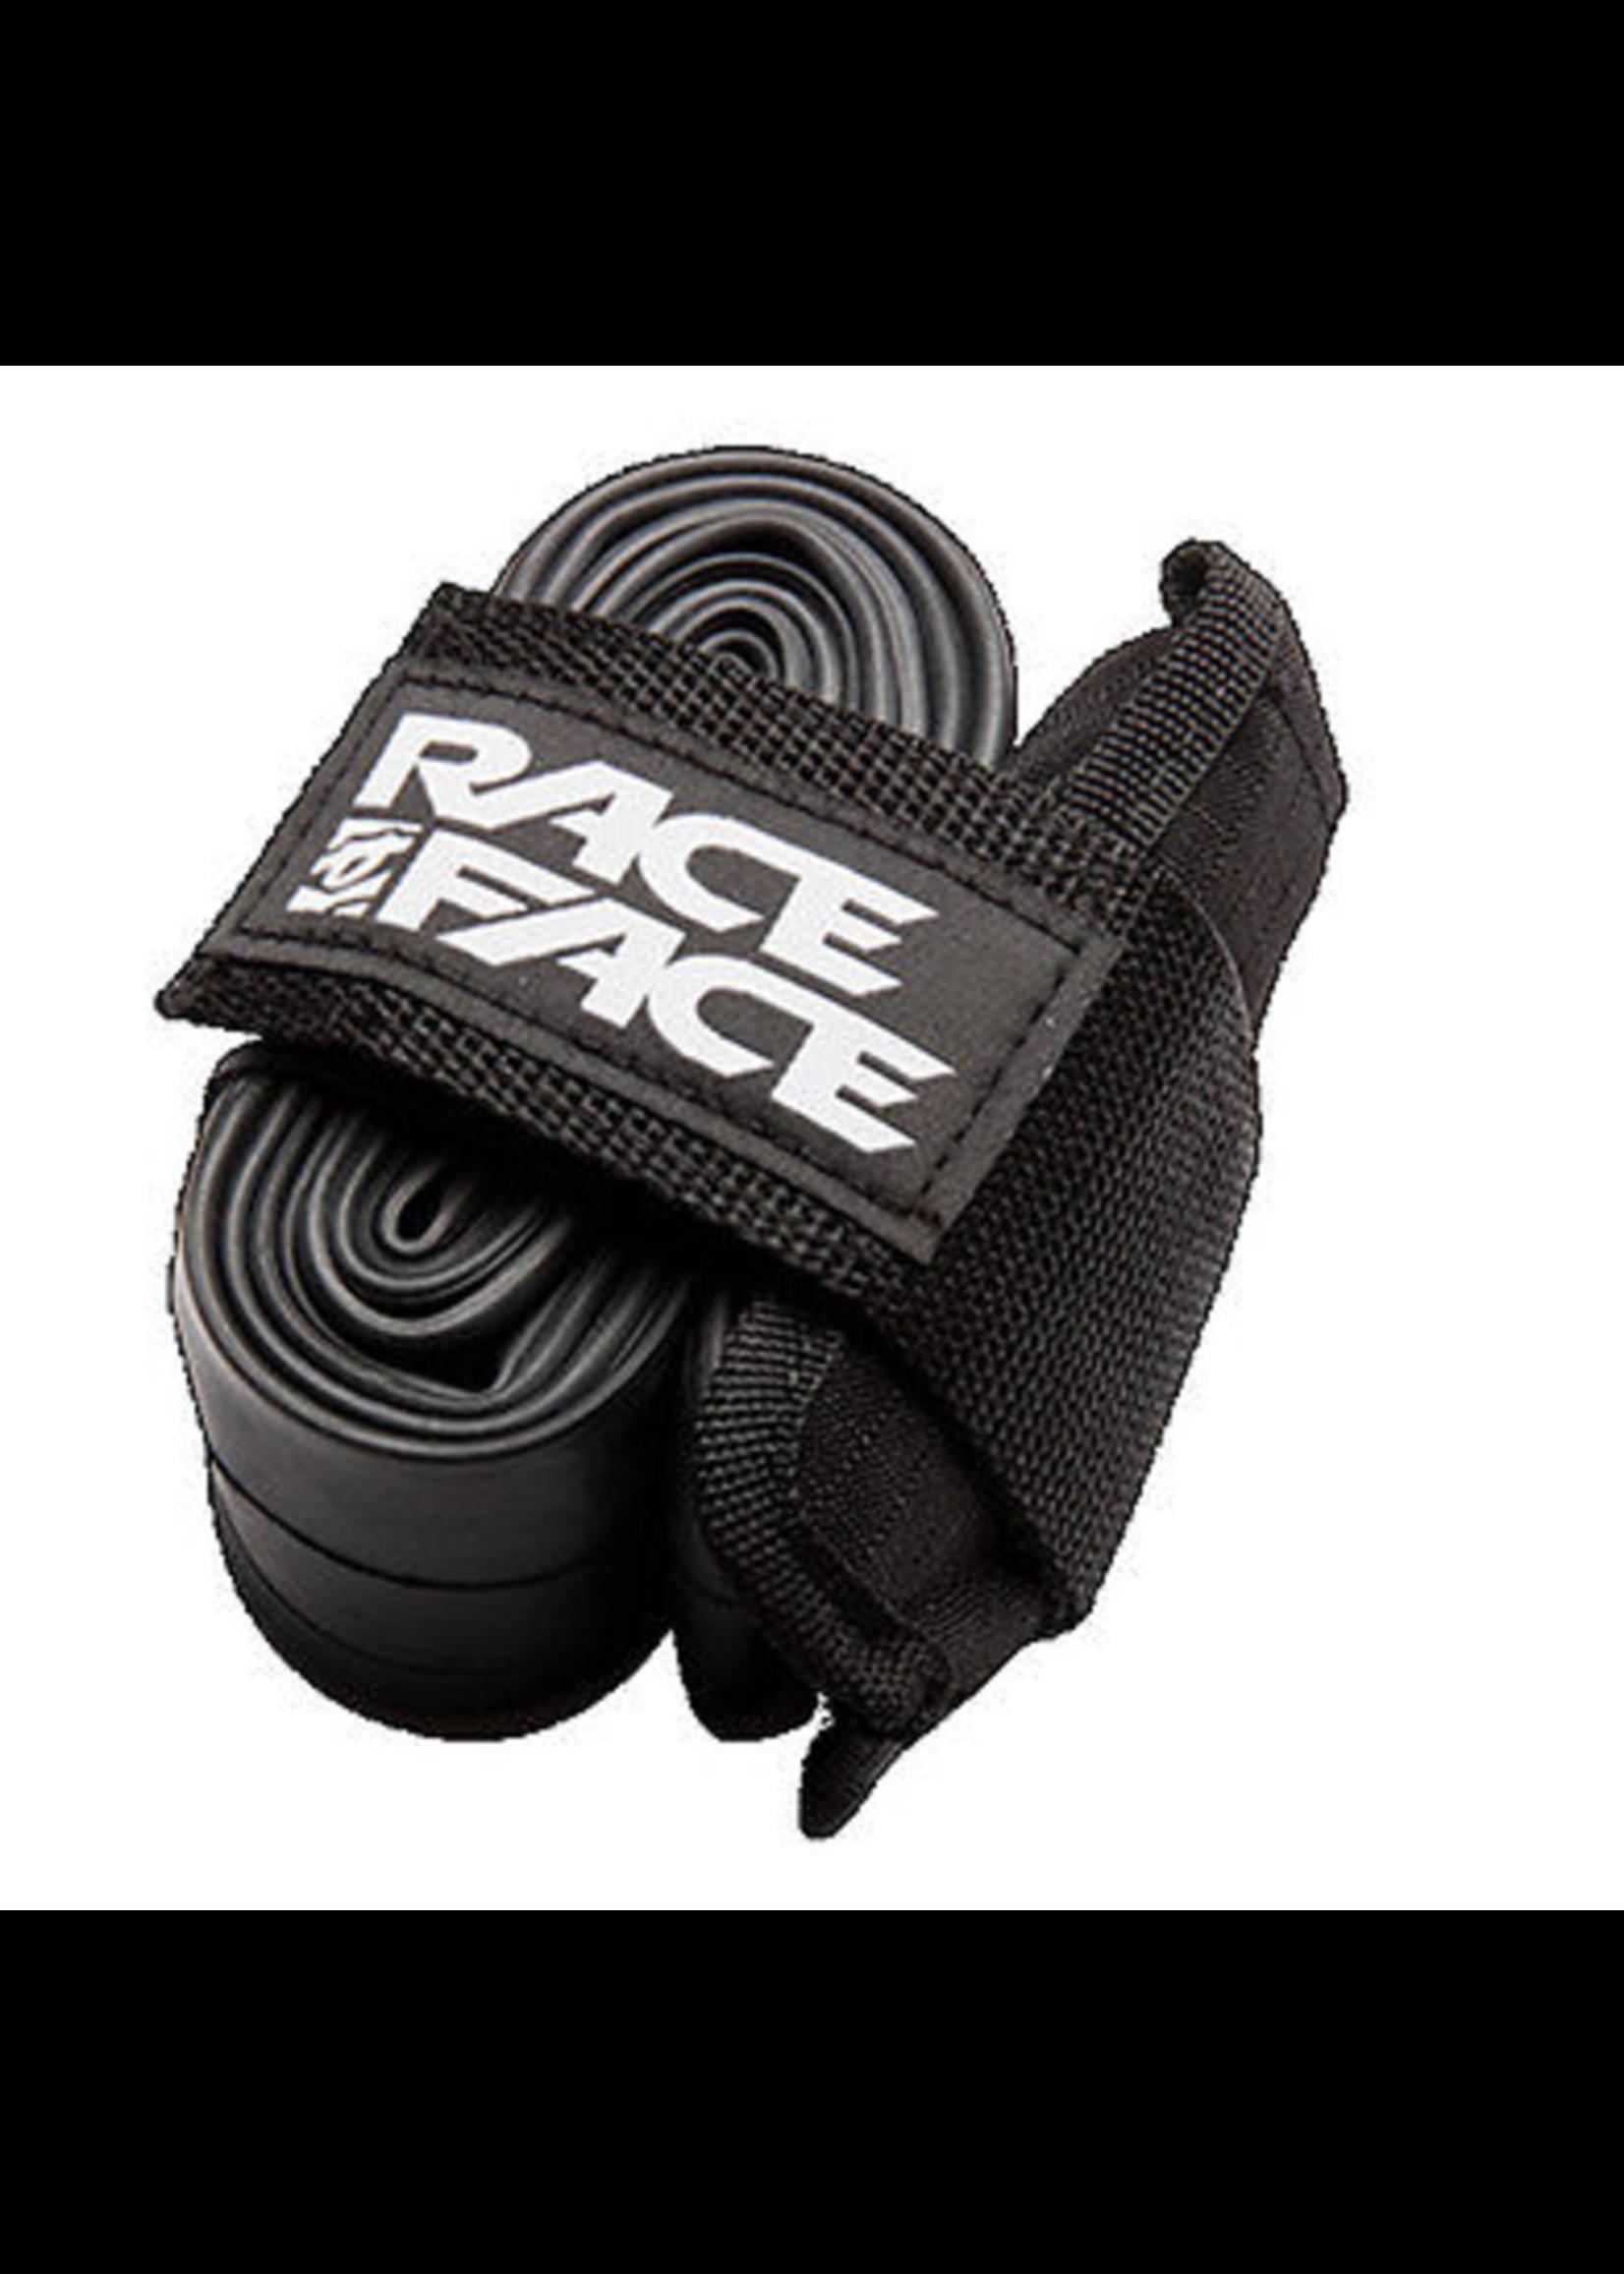 Raceface Raceface- Stash Tool Wrap